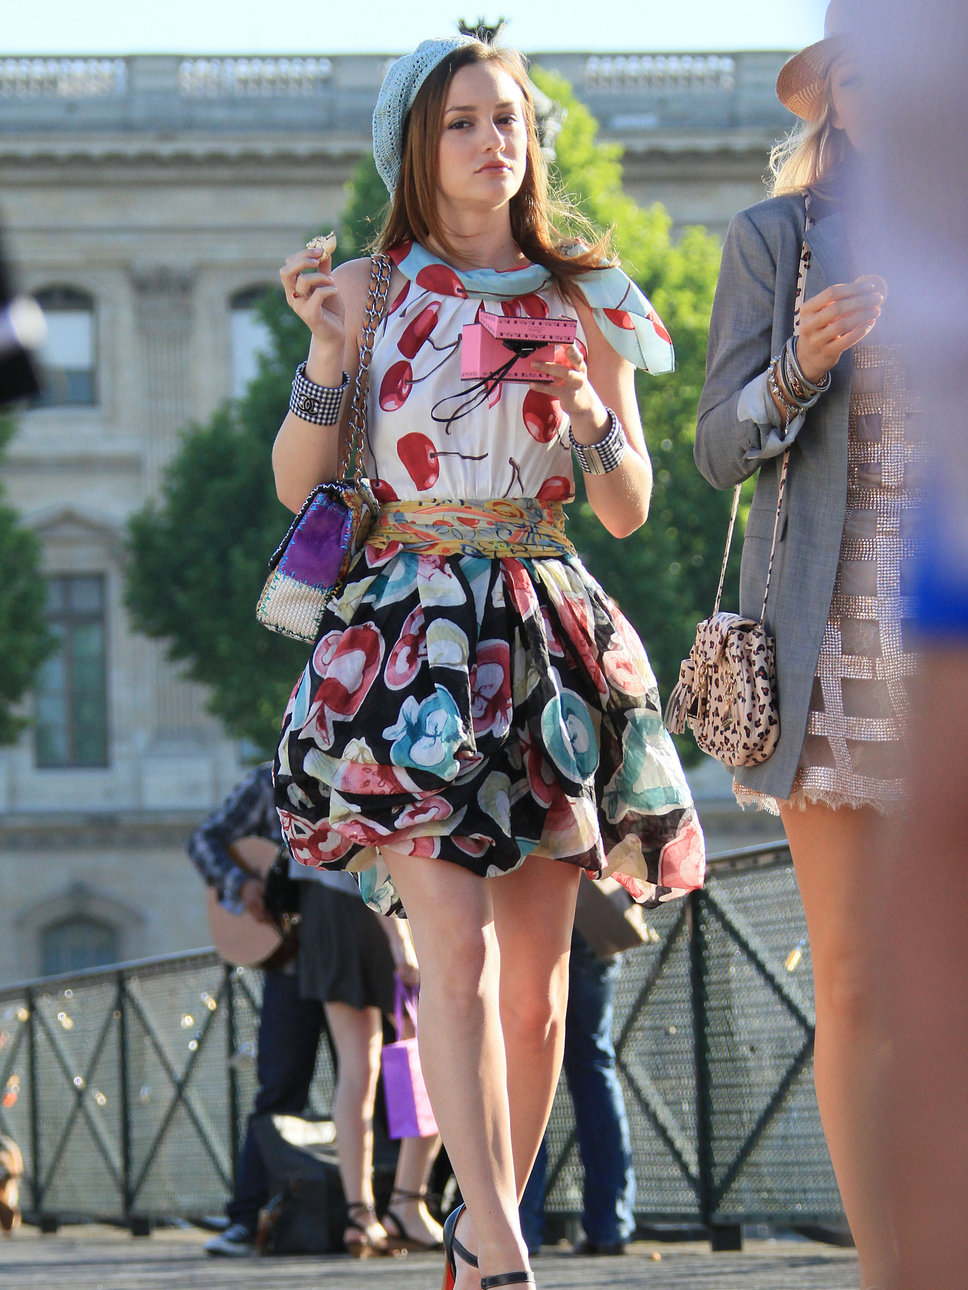 ... Wardrobe: DIY TIPS: Transform me into Blair Waldorf - Gossip Girl Gossip Girl Fashion Blair